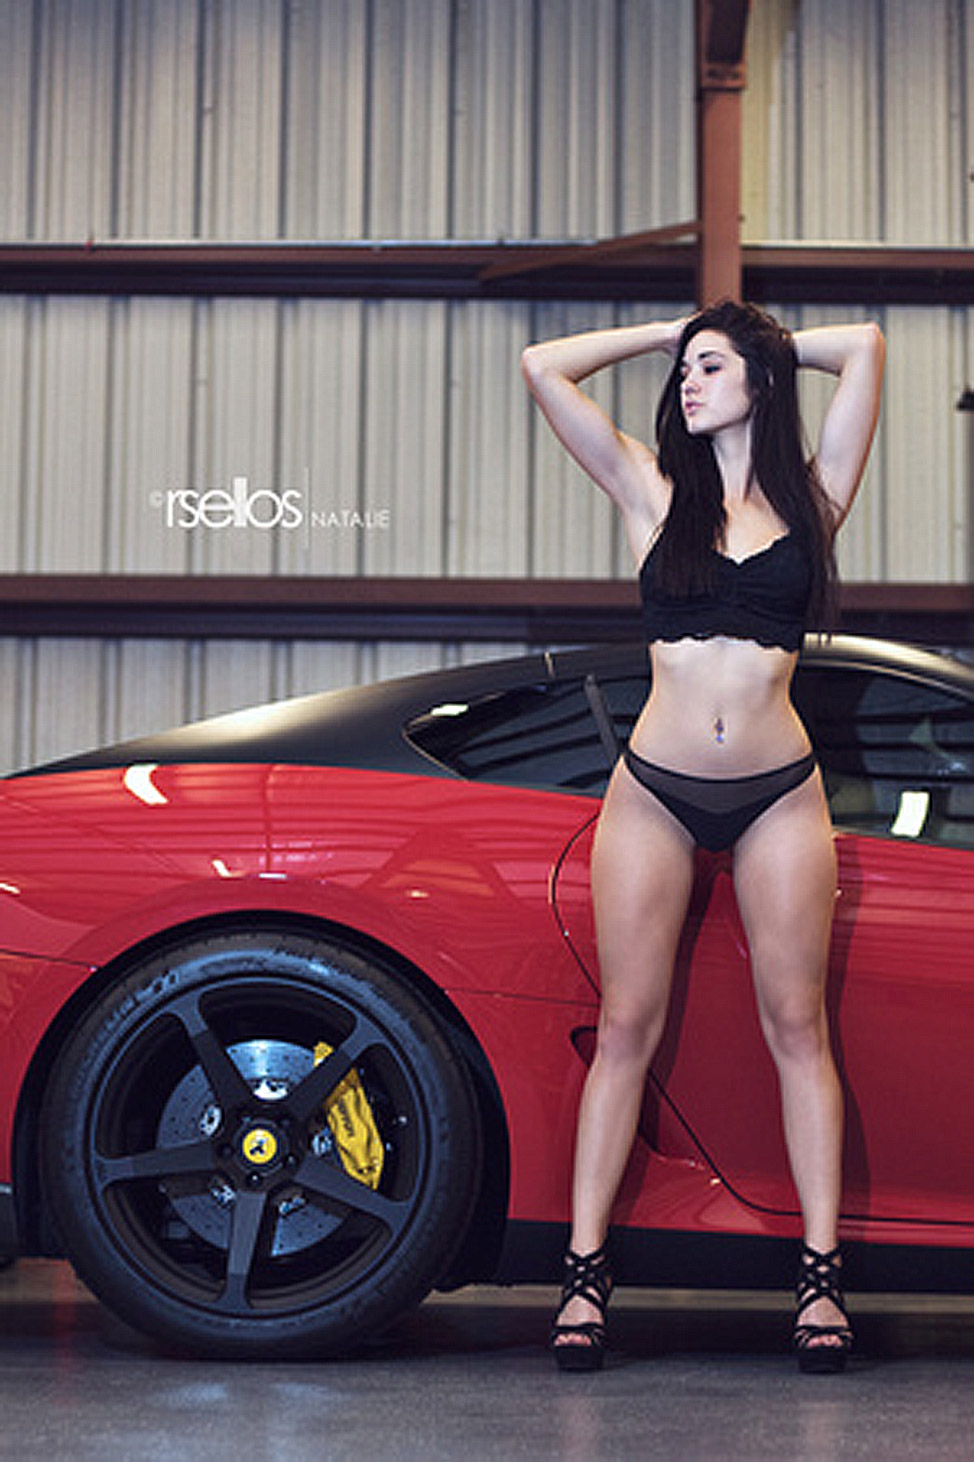 A ella le gusta la gasolina - 4 8